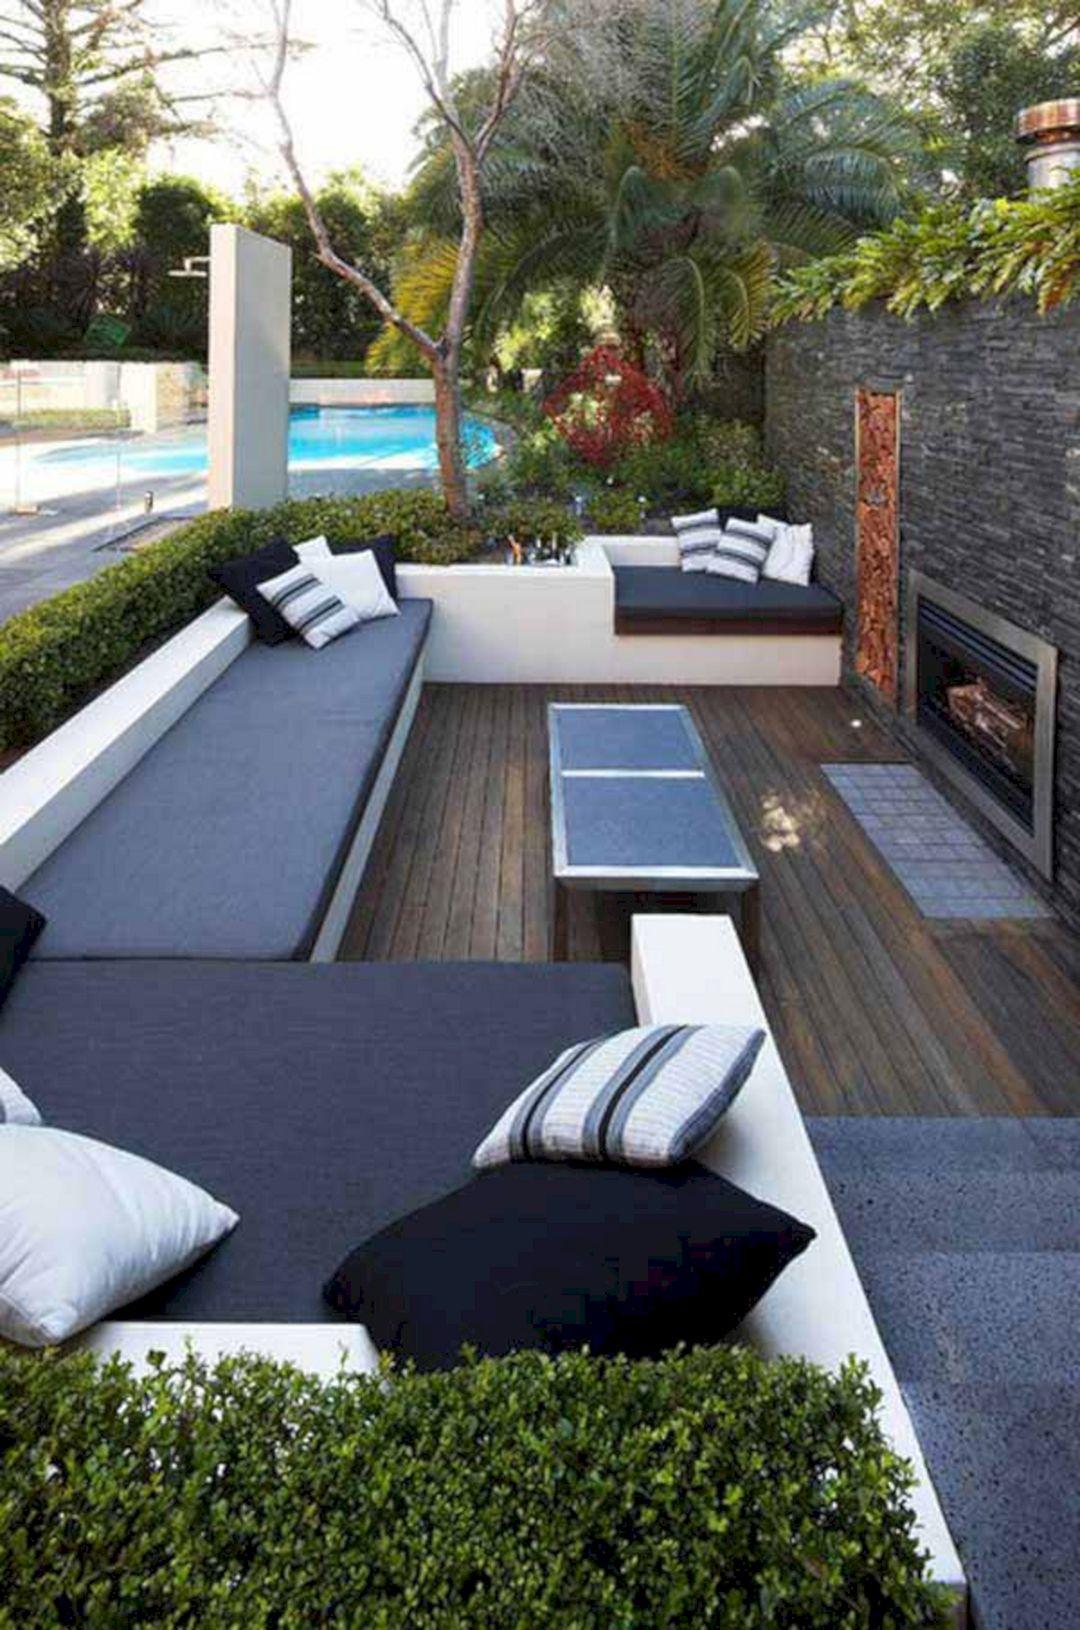 Garden Design Ideas With Seating Area 1